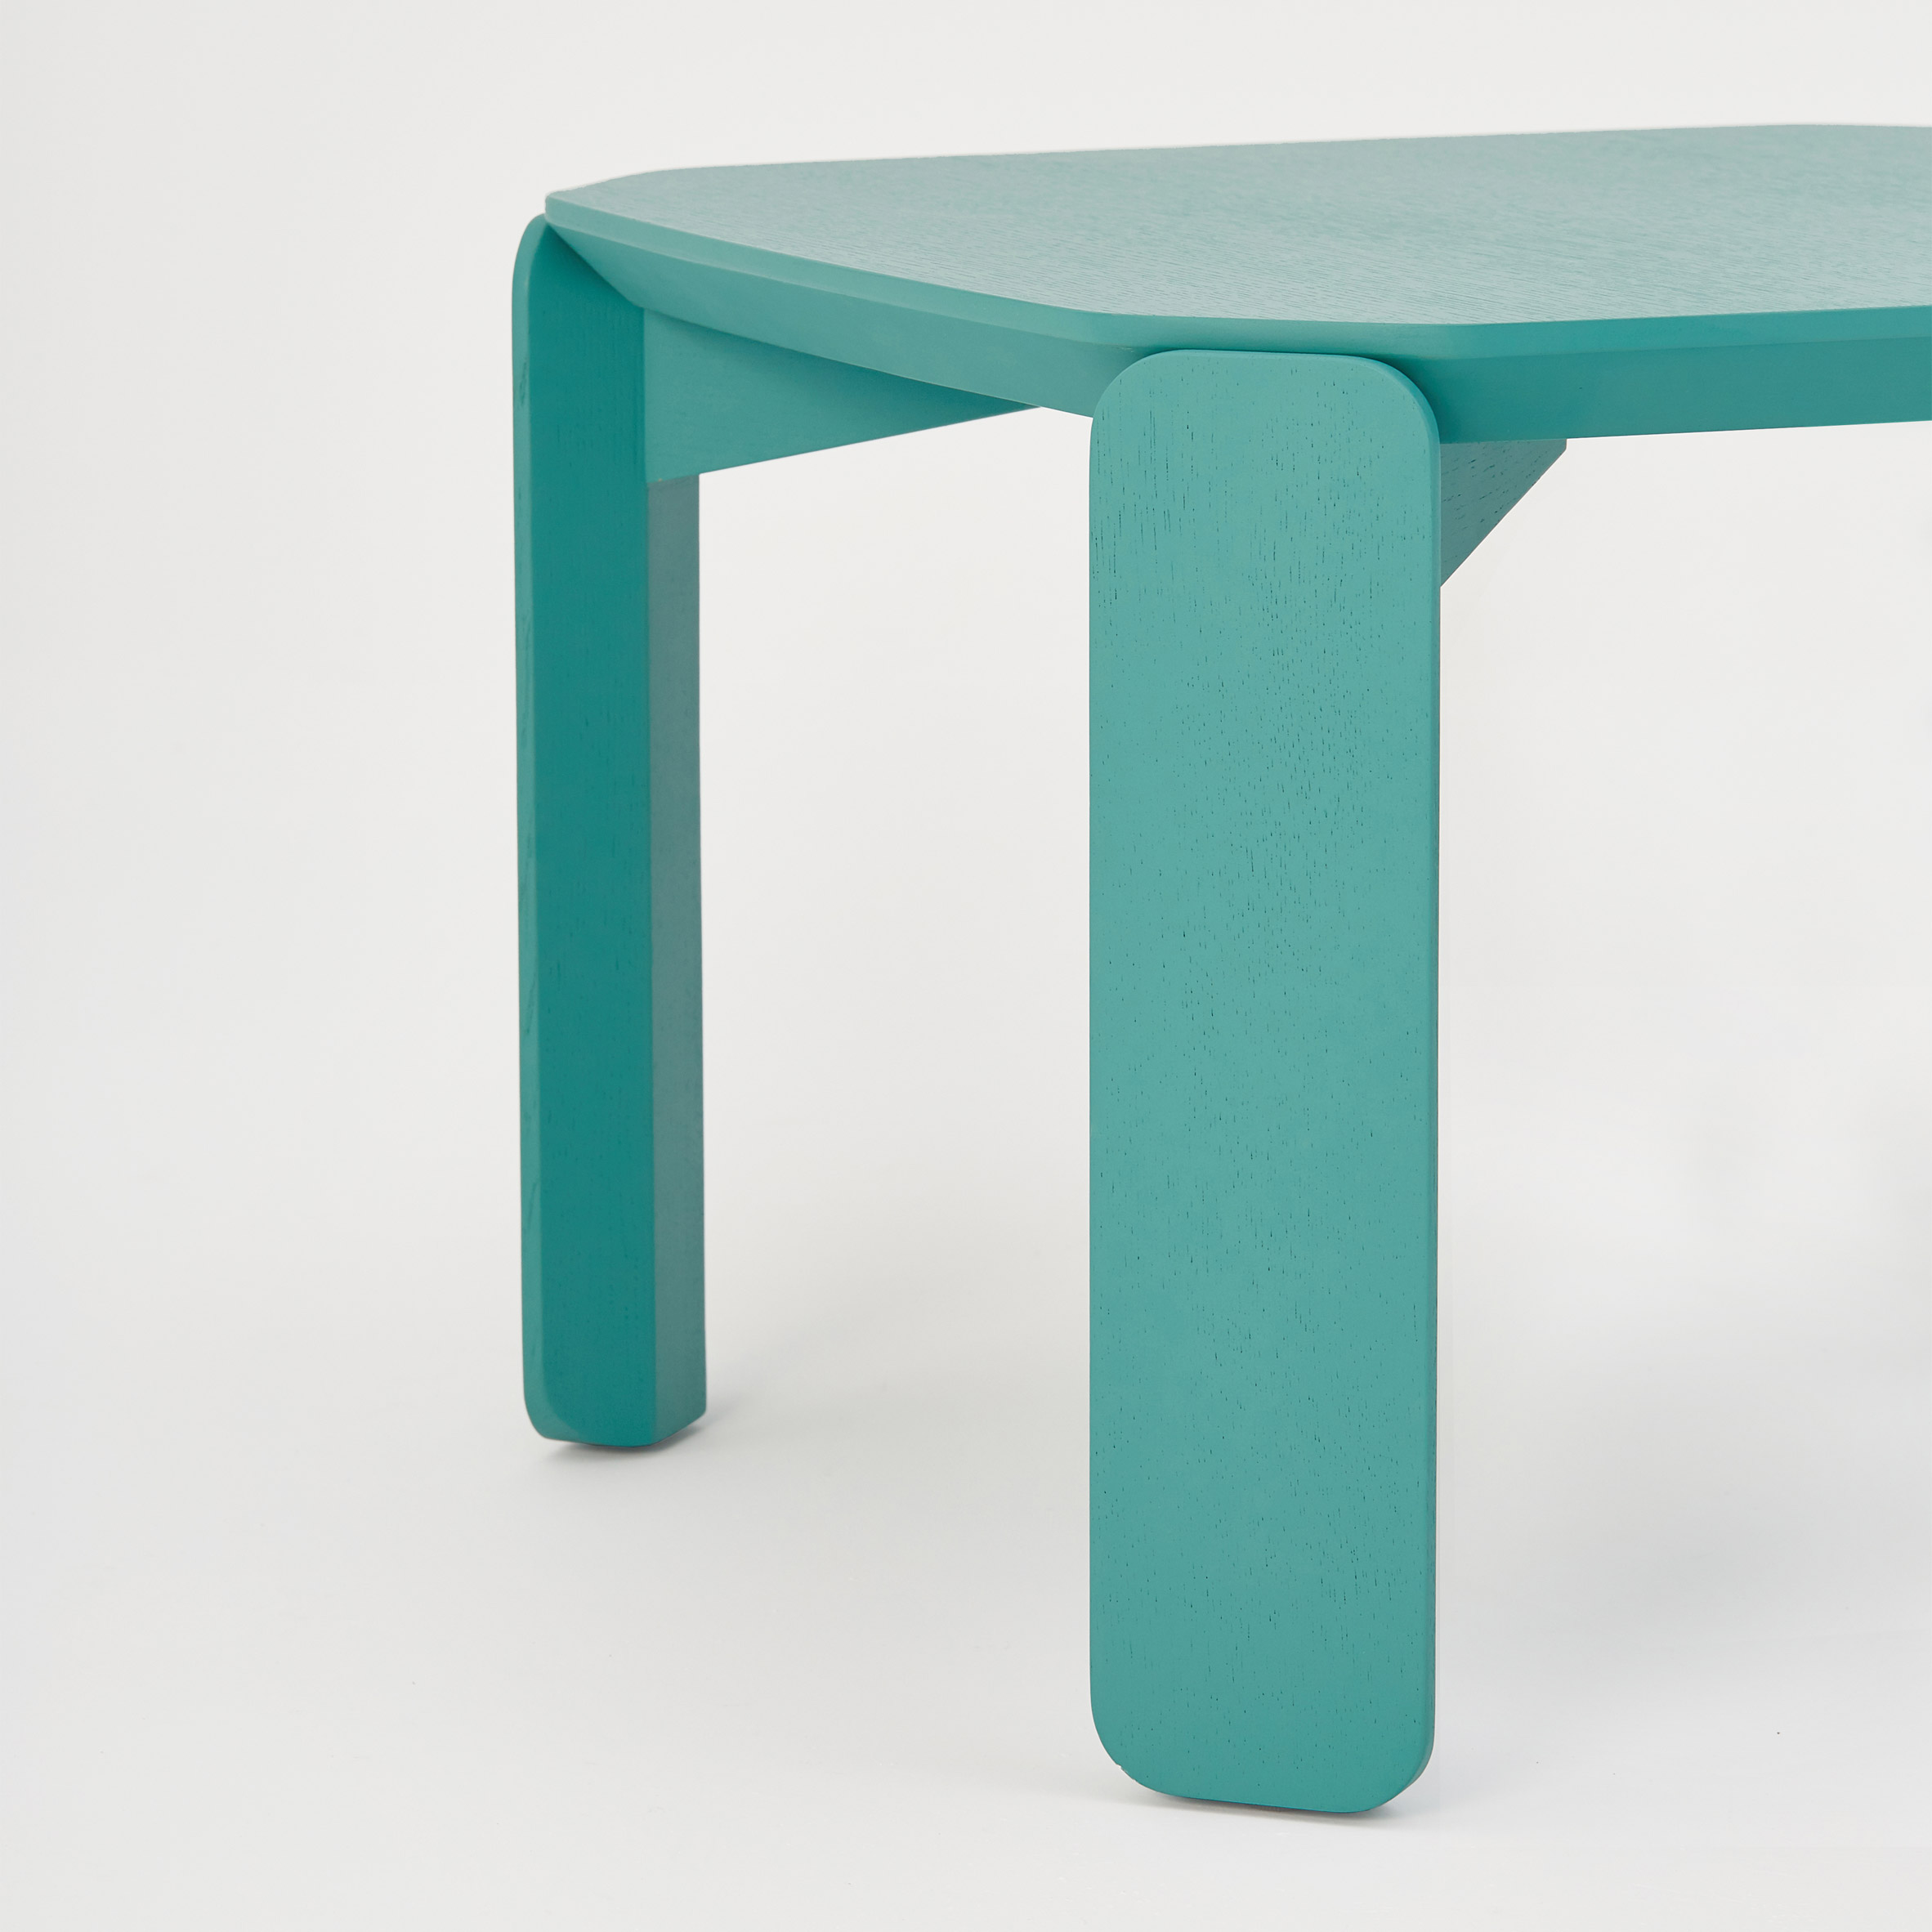 45-table-system-inyard-la-selva-design-furniture_dezeen_2364_col_6